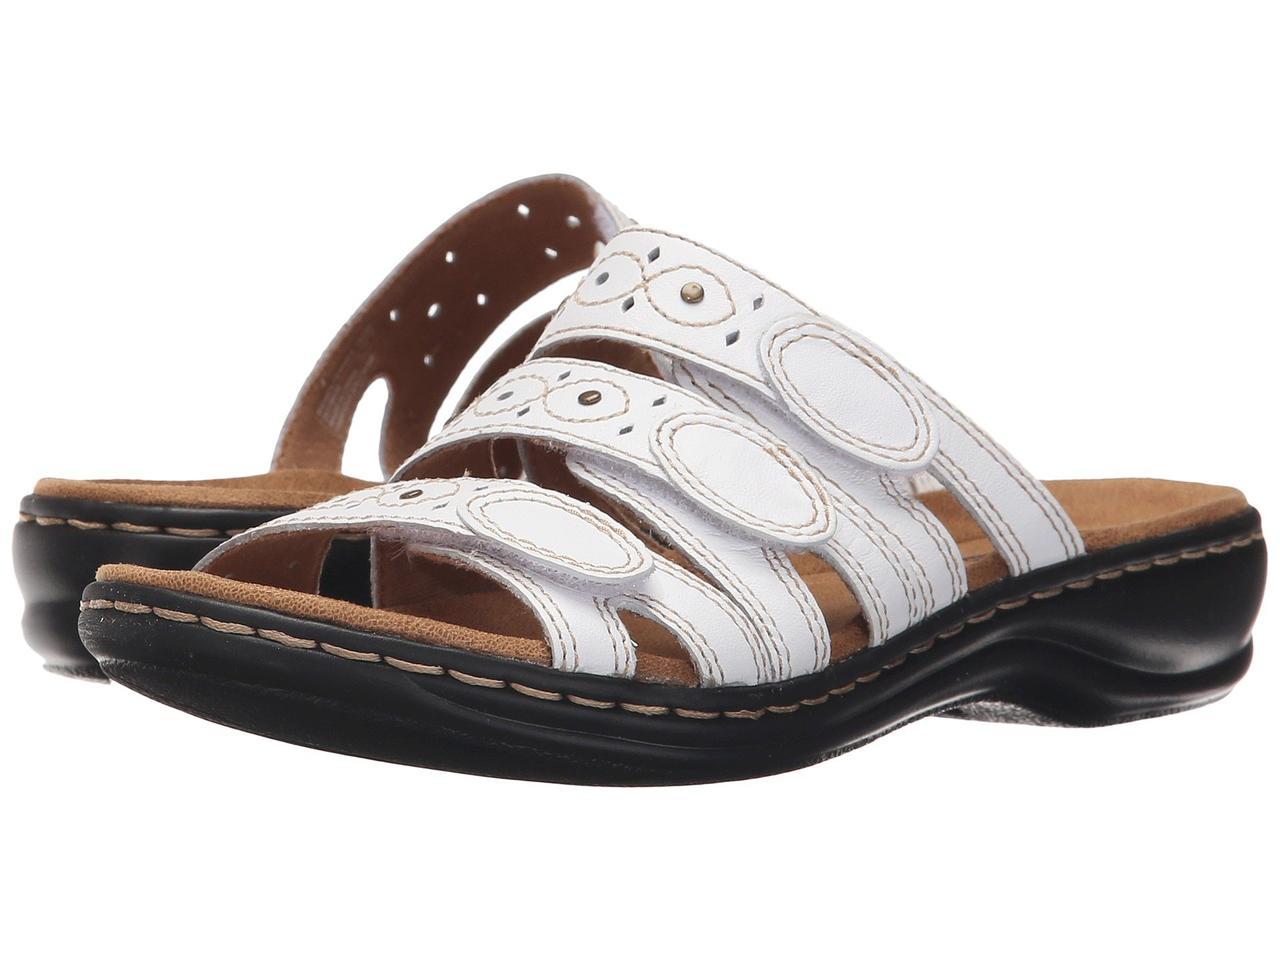 Сандали/Вьетнамки (Оригинал) Clarks Leisa Cacti Q White Leather